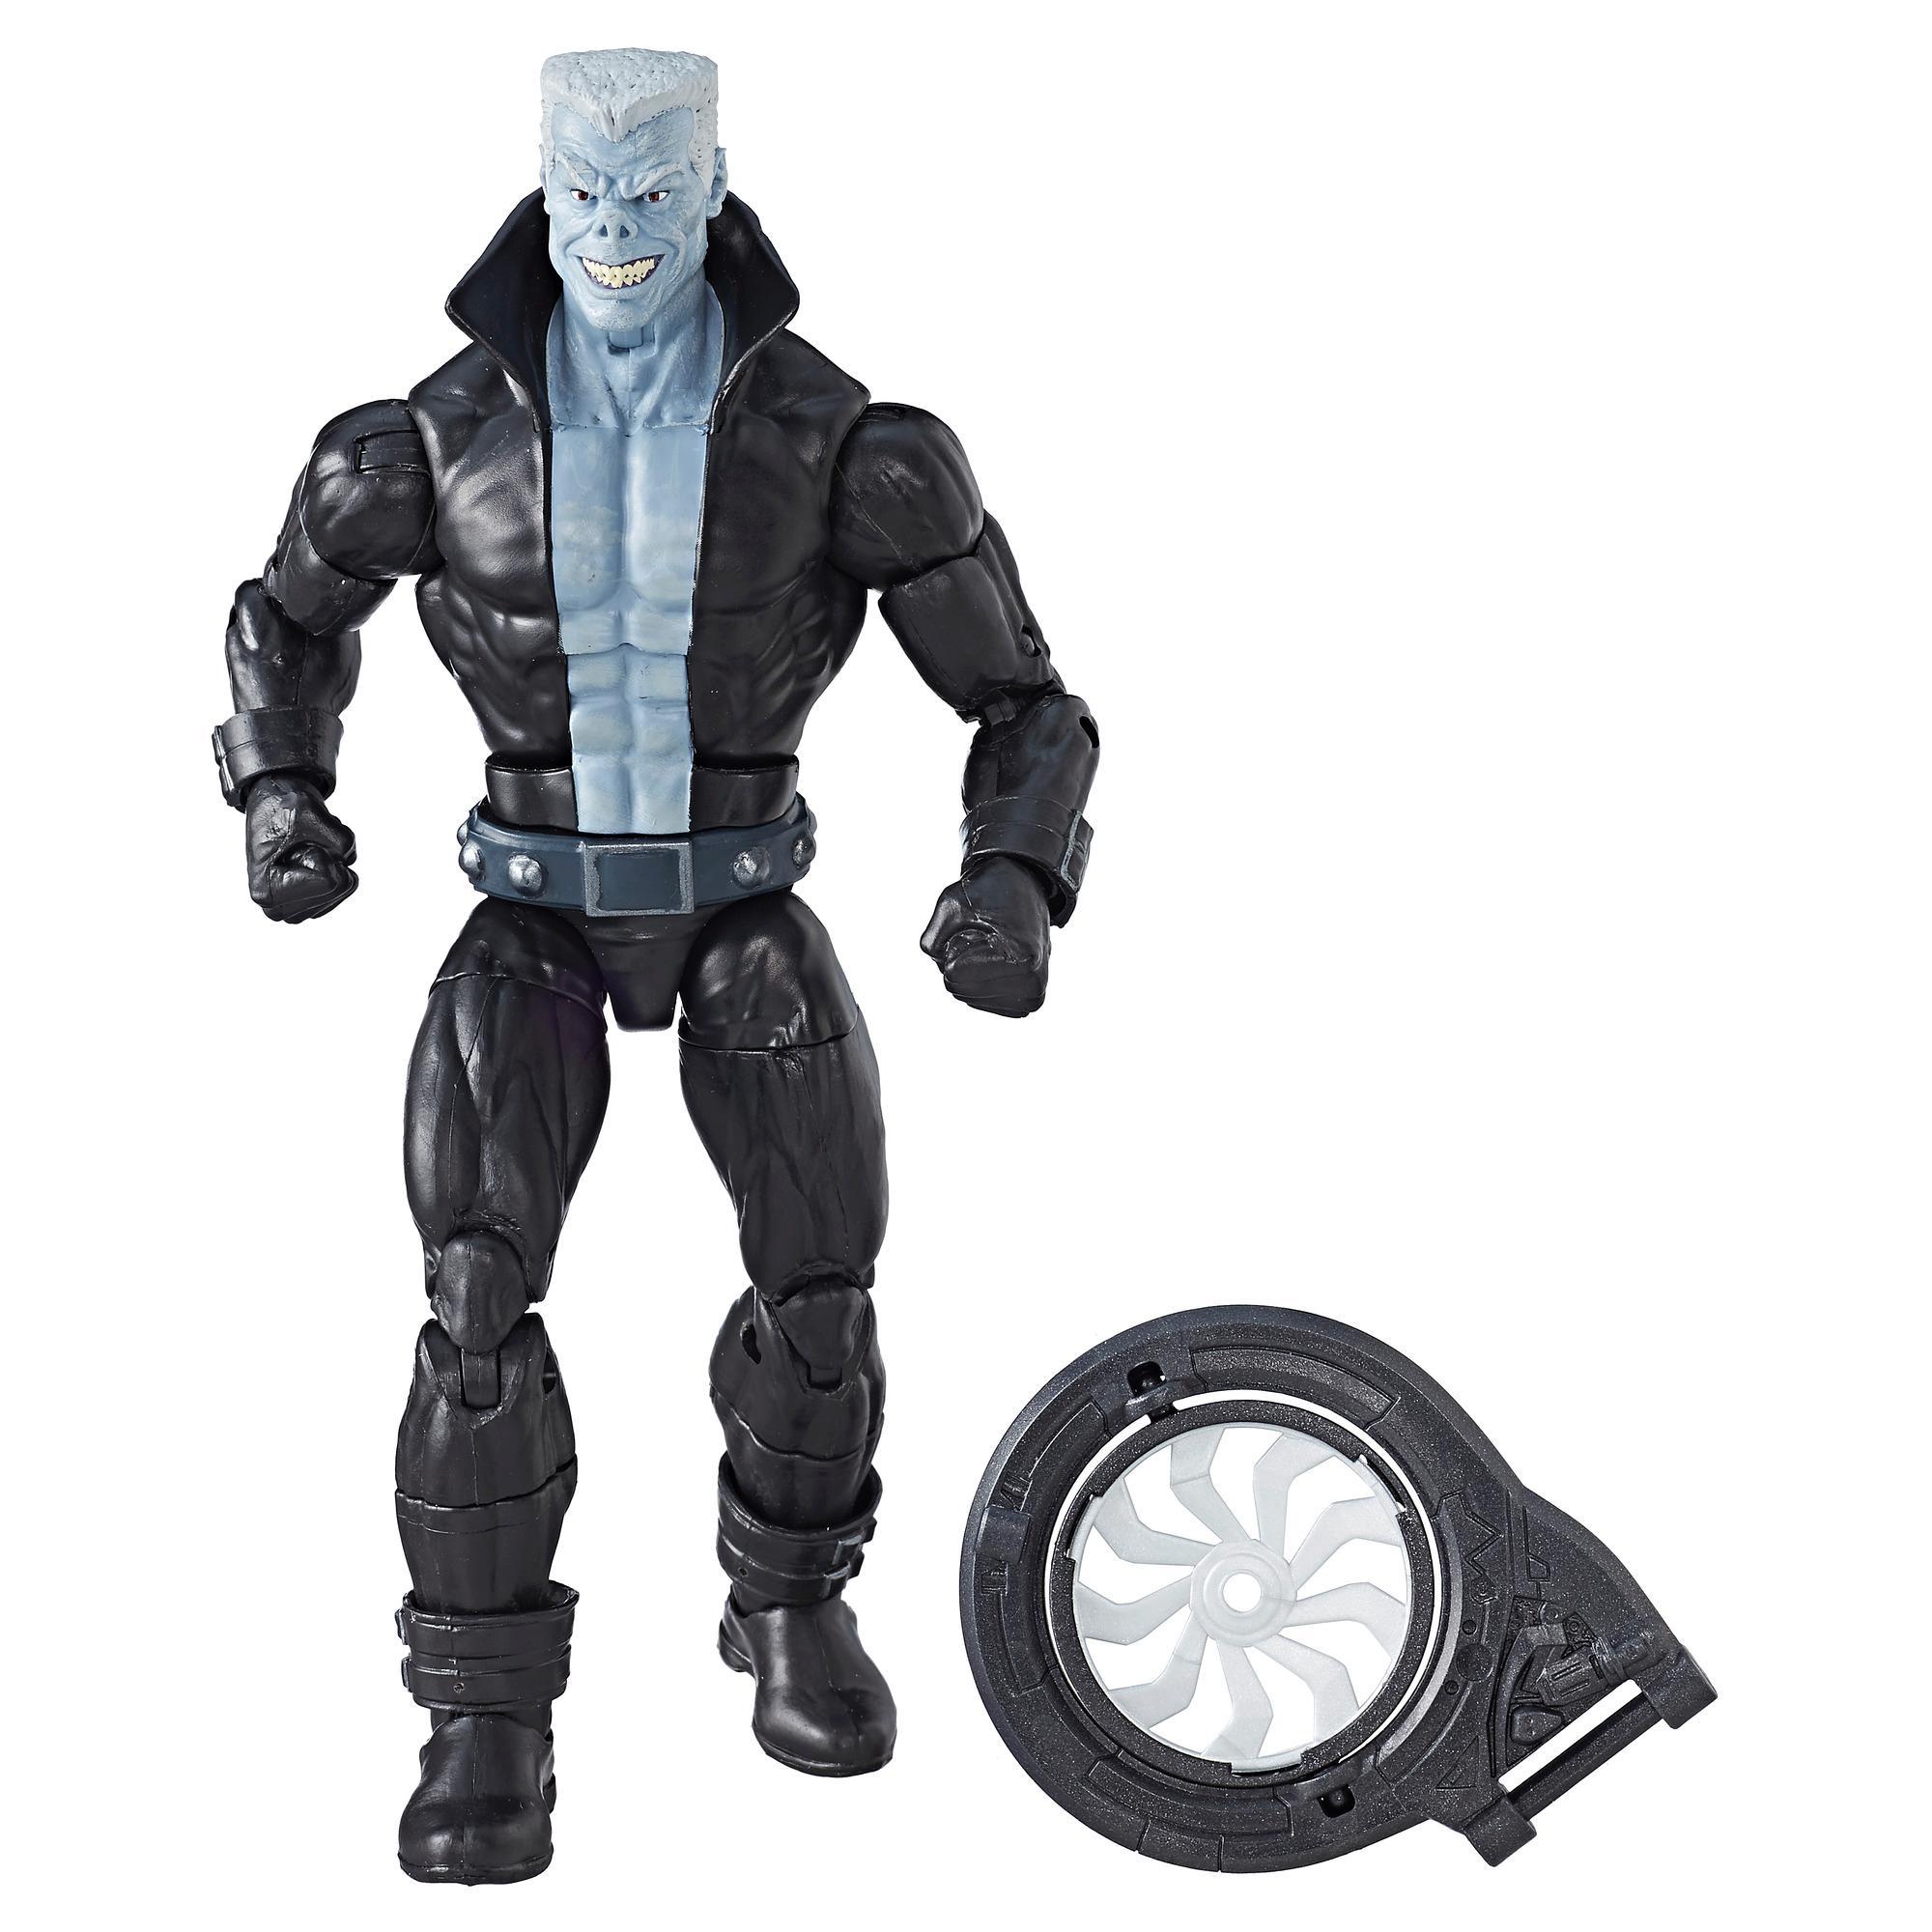 Marvel Spider-Man 6-inch Legends Series Sinister Villains: Marvel's Tombstone